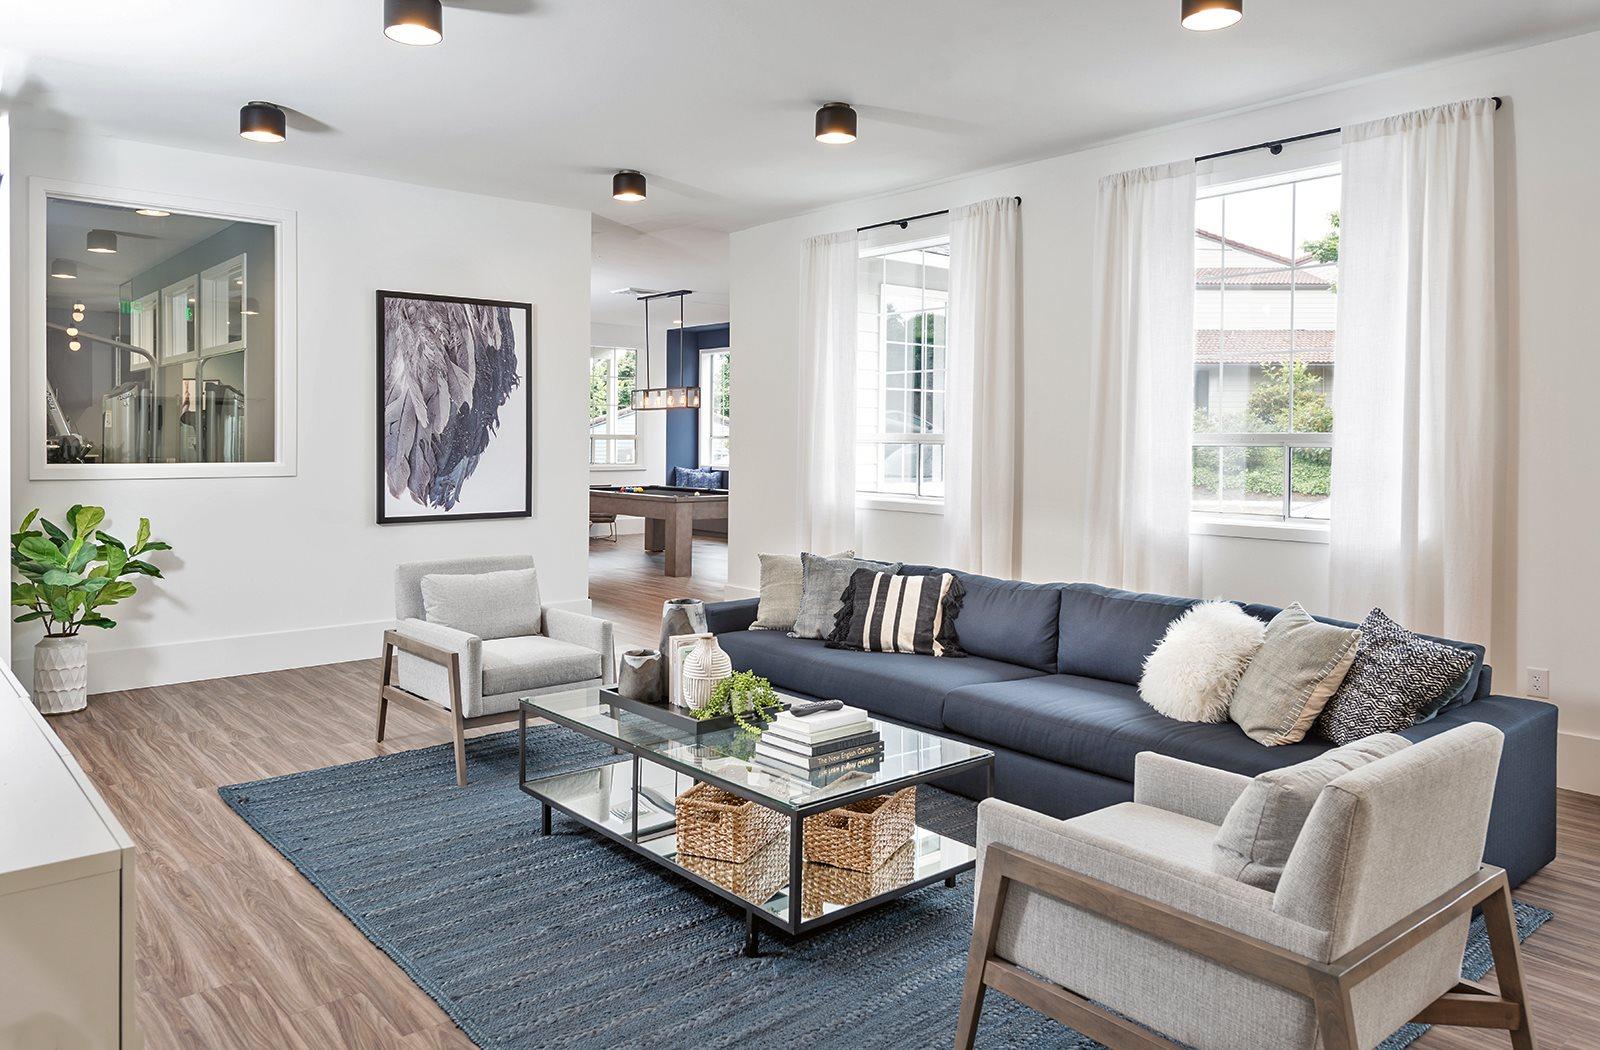 Breckenridge Apartment Homes homepagegallery 3